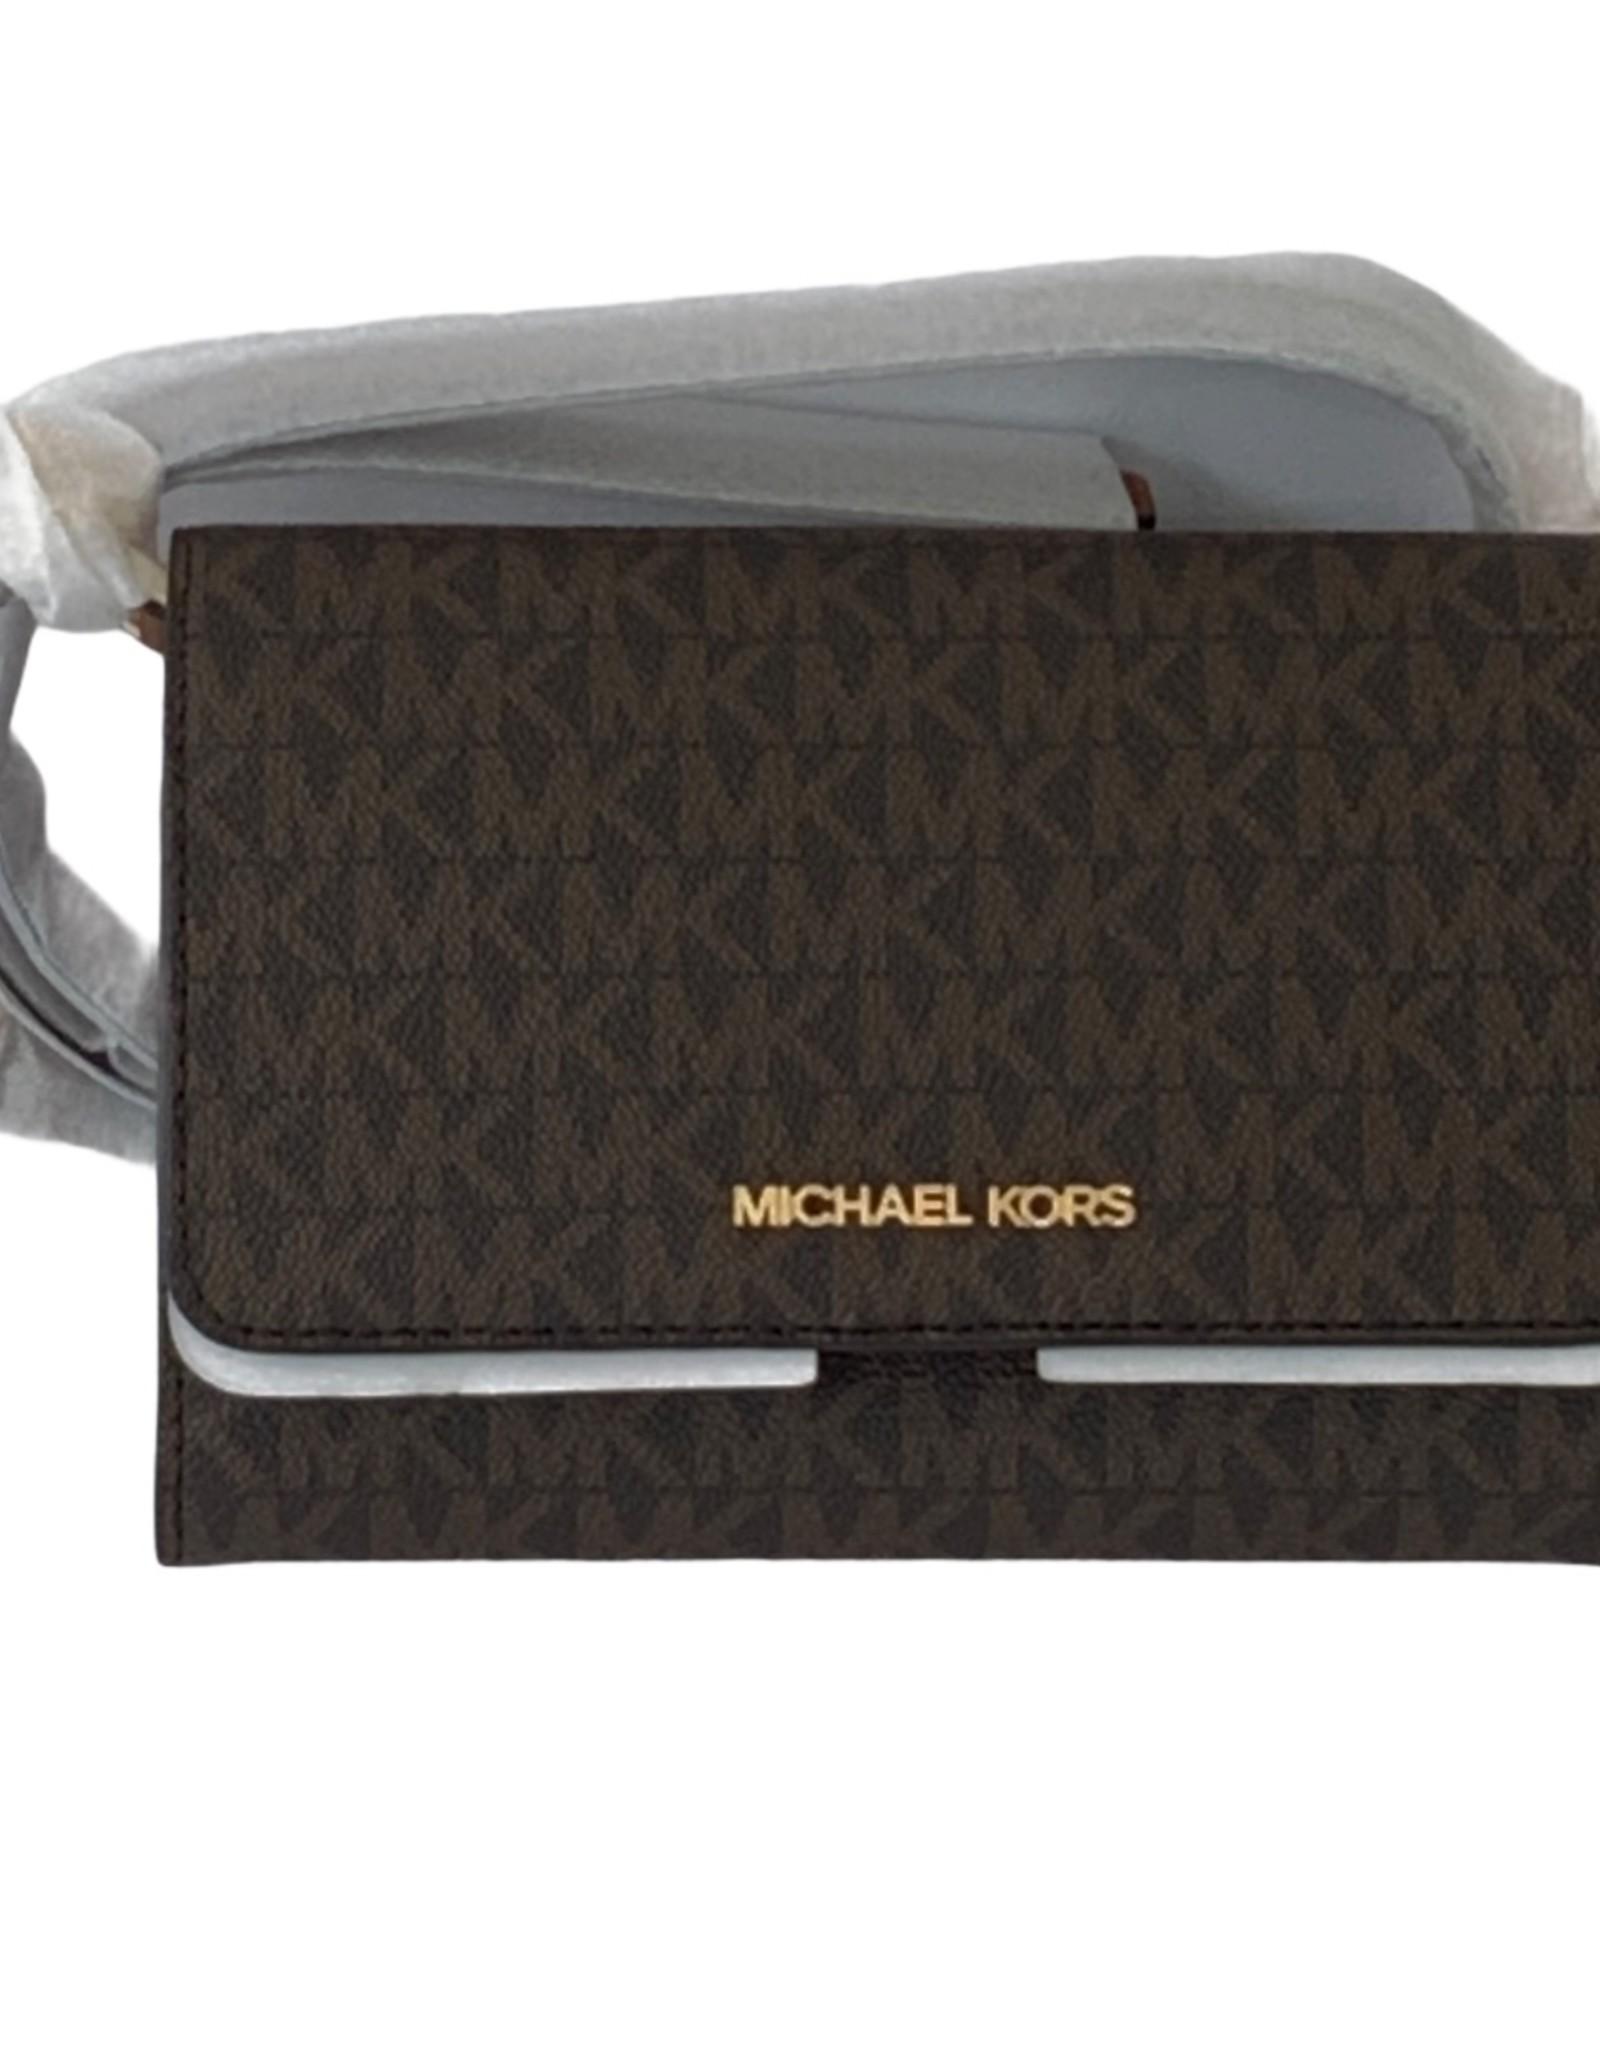 Michael Kors Michael Kors Jet Set Travel Phone Crossbody